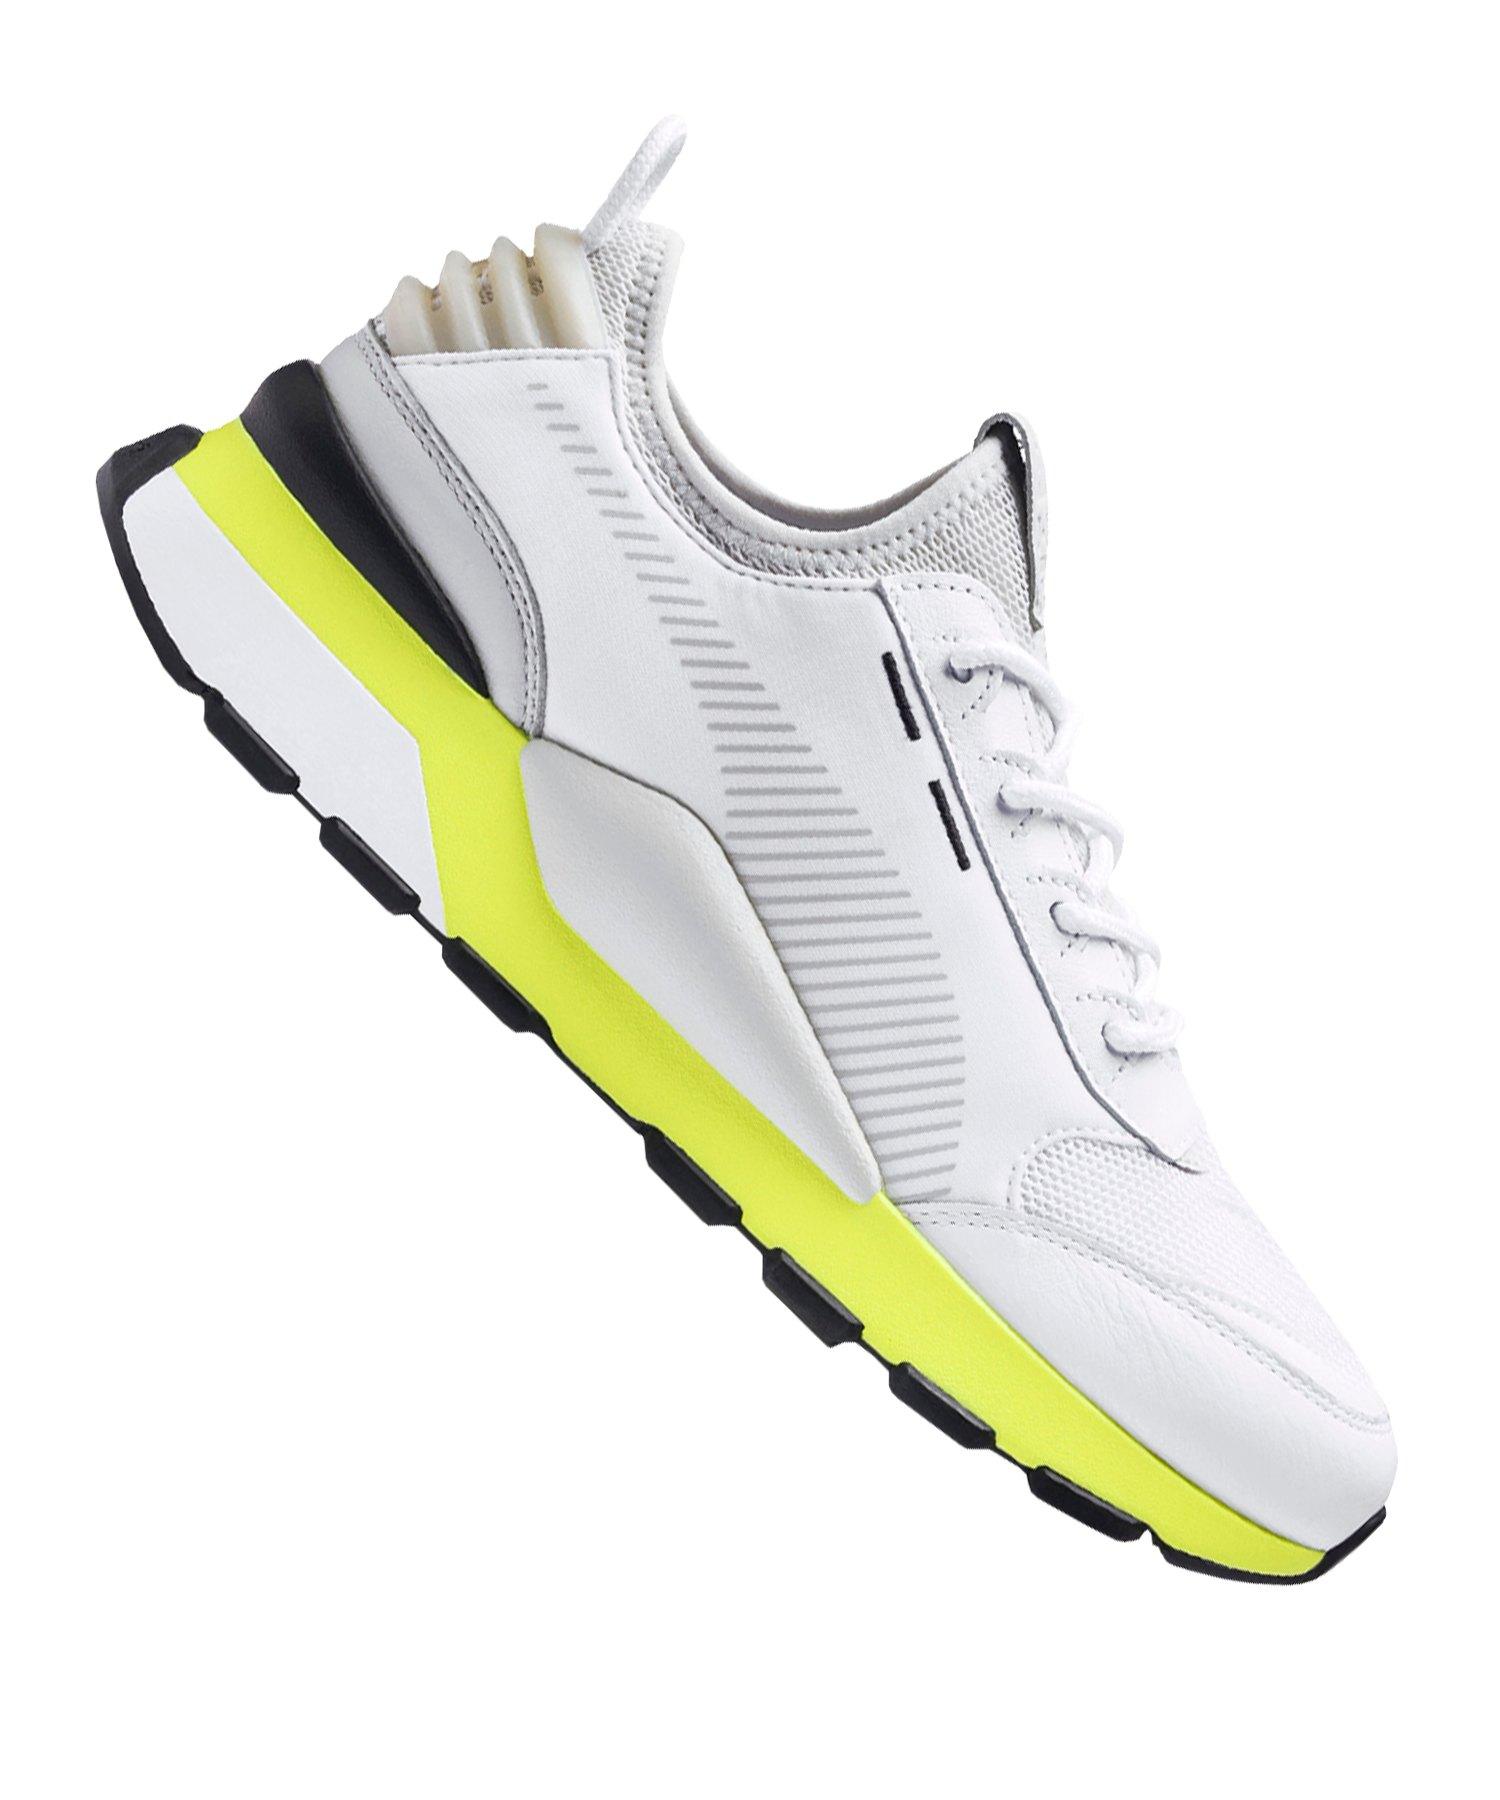 PUMA RS-0 TRACKS Sneaker Weiss Gelb F03 - weiss